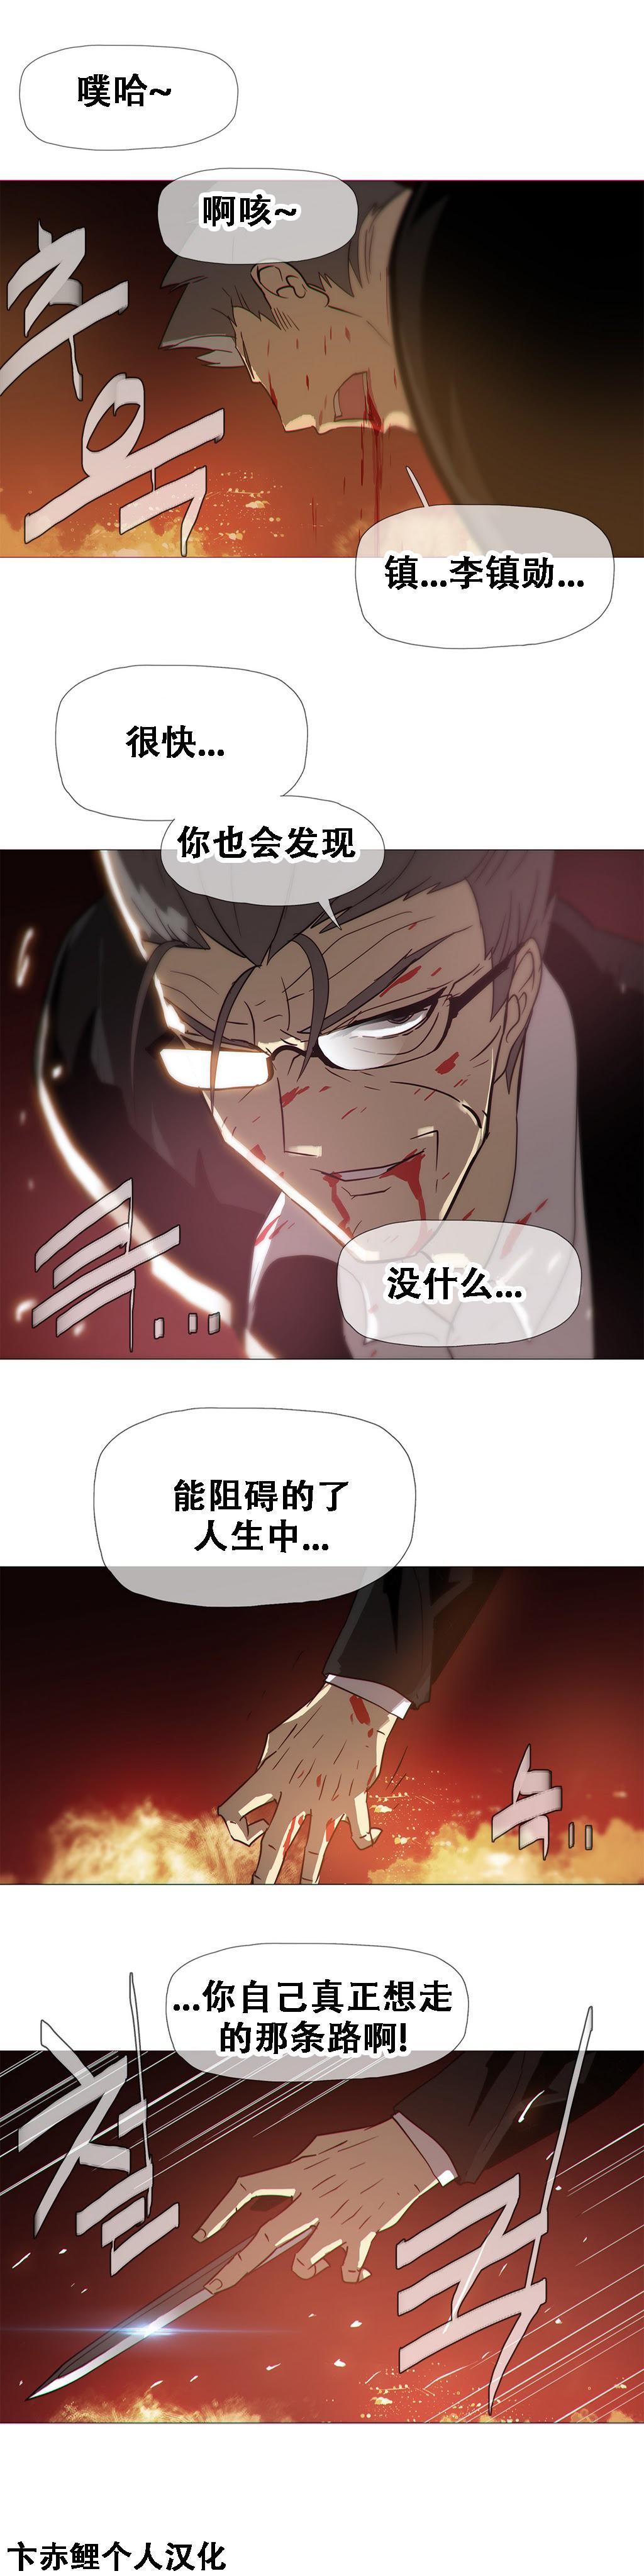 HouseHold Affairs 【卞赤鲤个人汉化】1~21话(持续更新中) 394